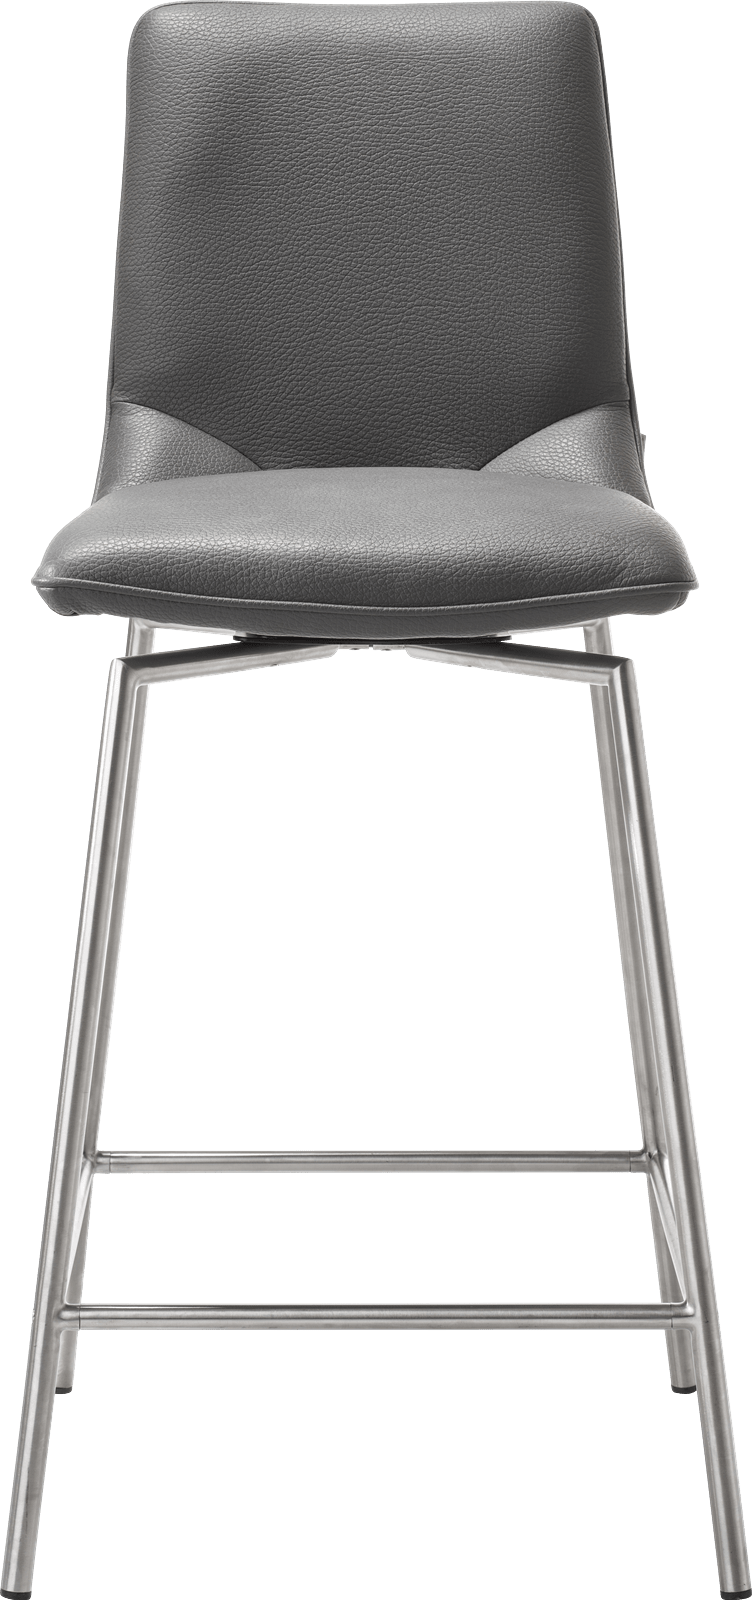 Bar Chaise Davy Chaise InoxTatra De Davy dBorWCeQxE